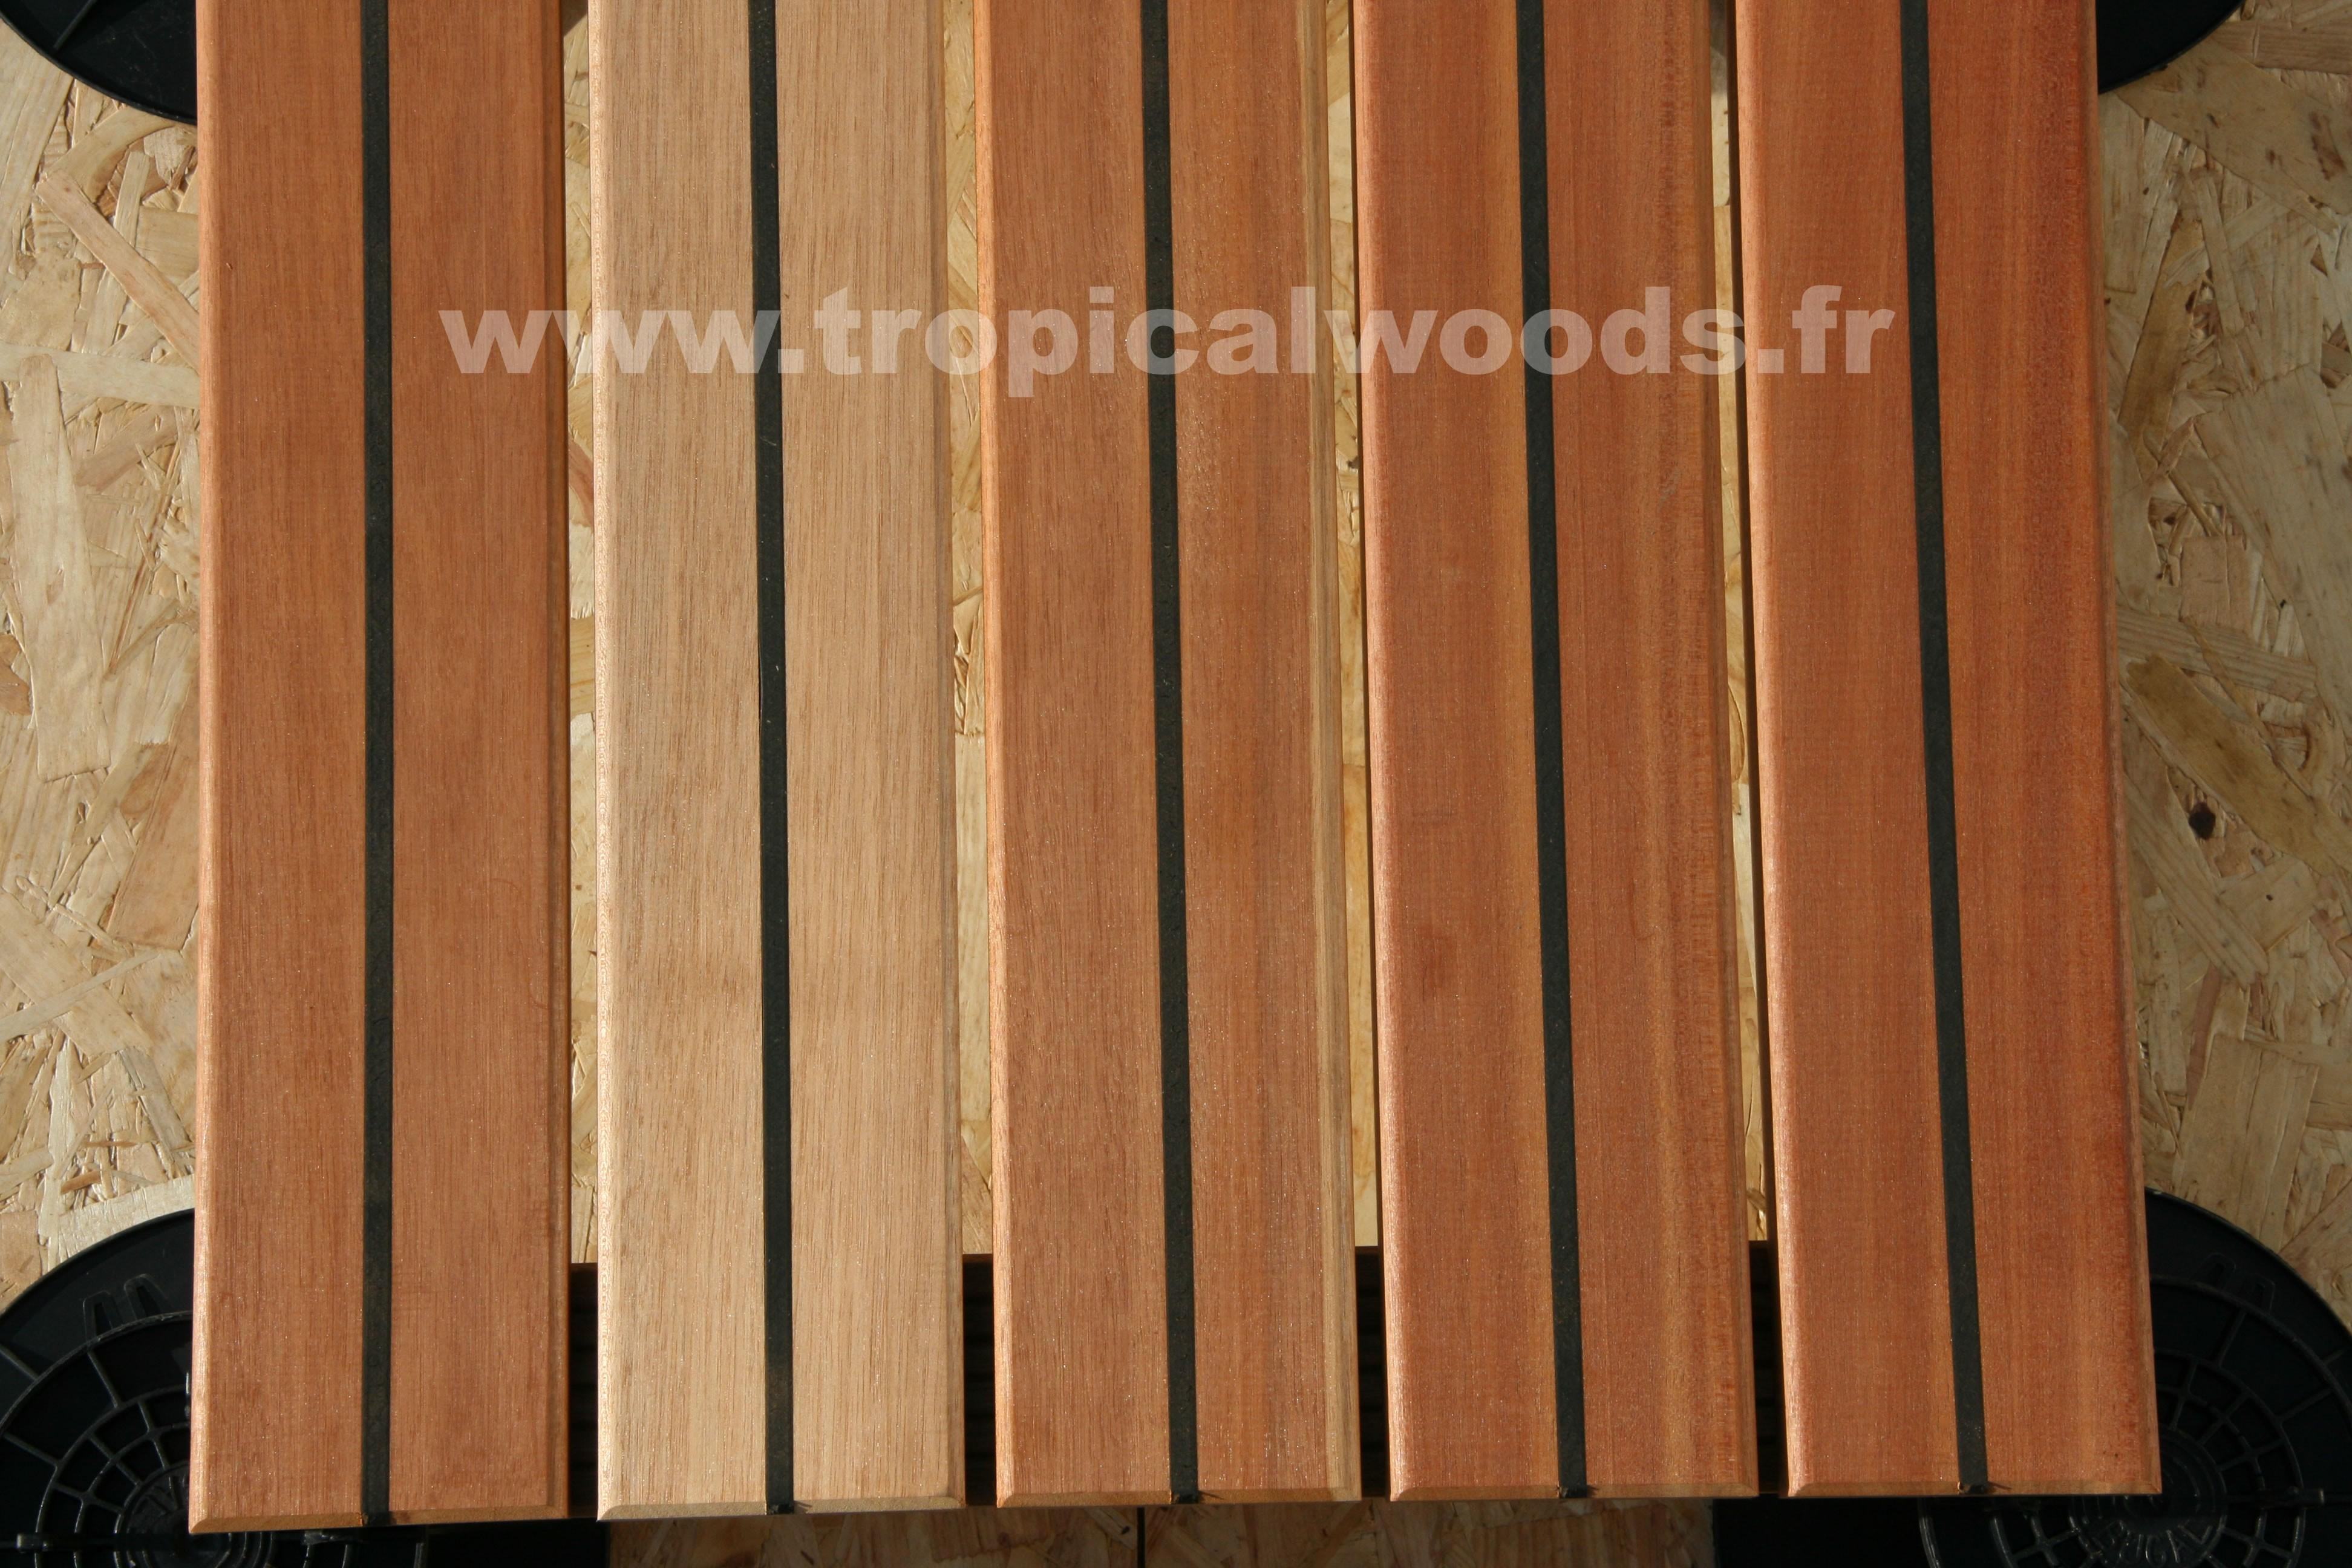 Terrasse - Lames parquet massif Macaranduba Pont de Bateau - 22 x 120 mm